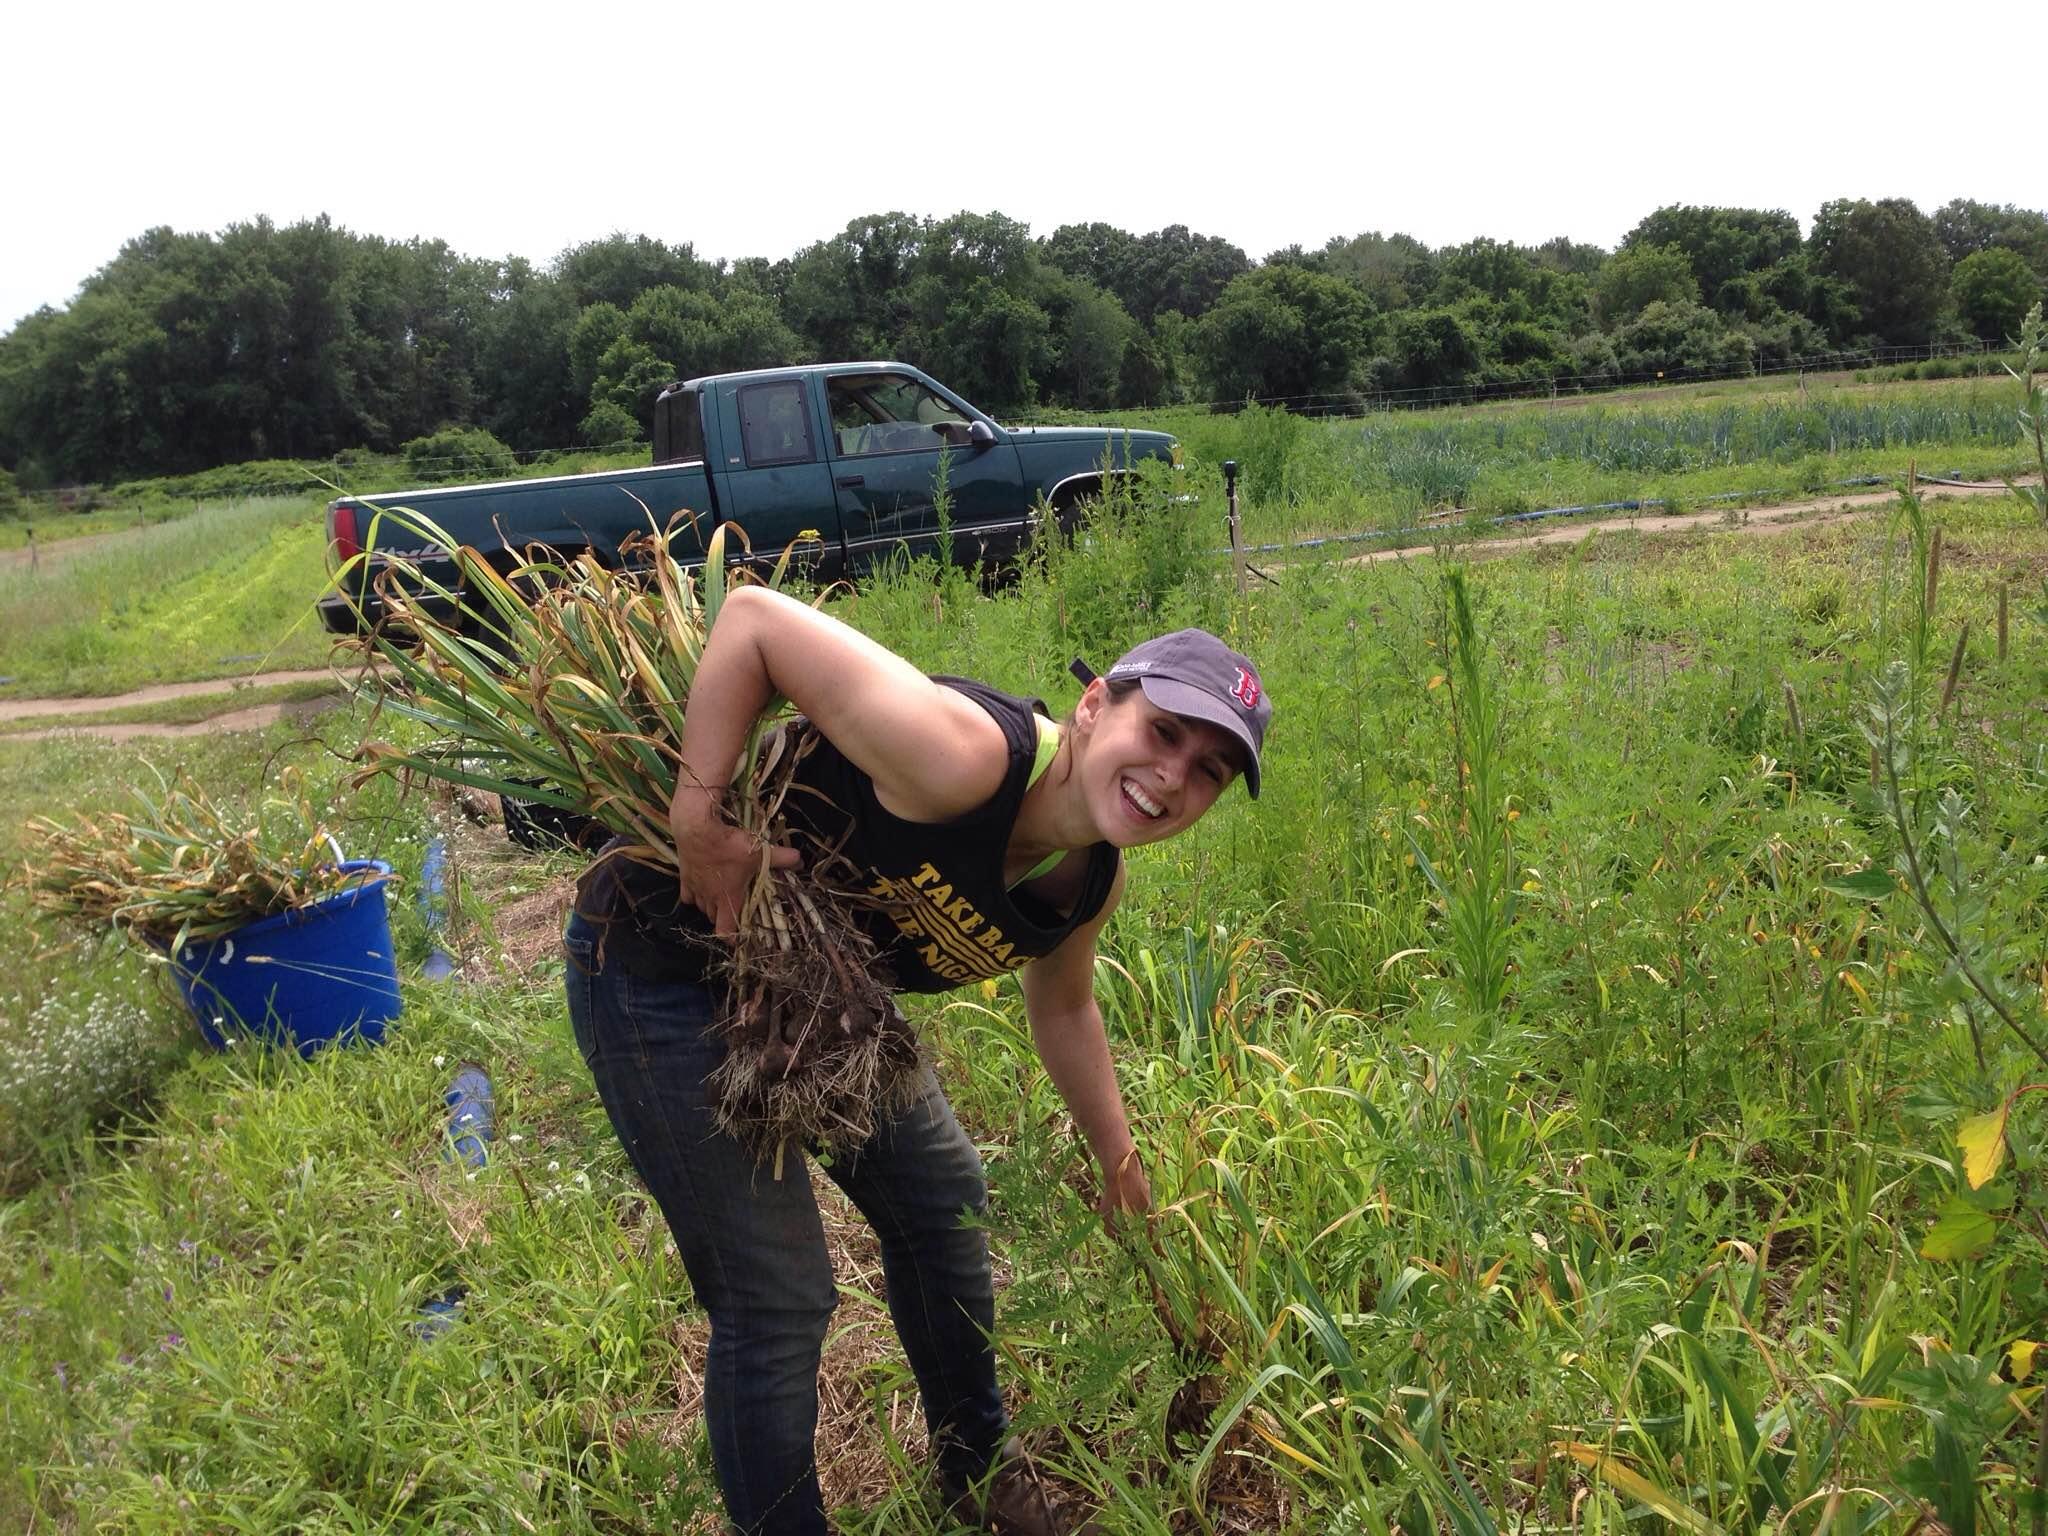 Lauren pulls garlic from the field